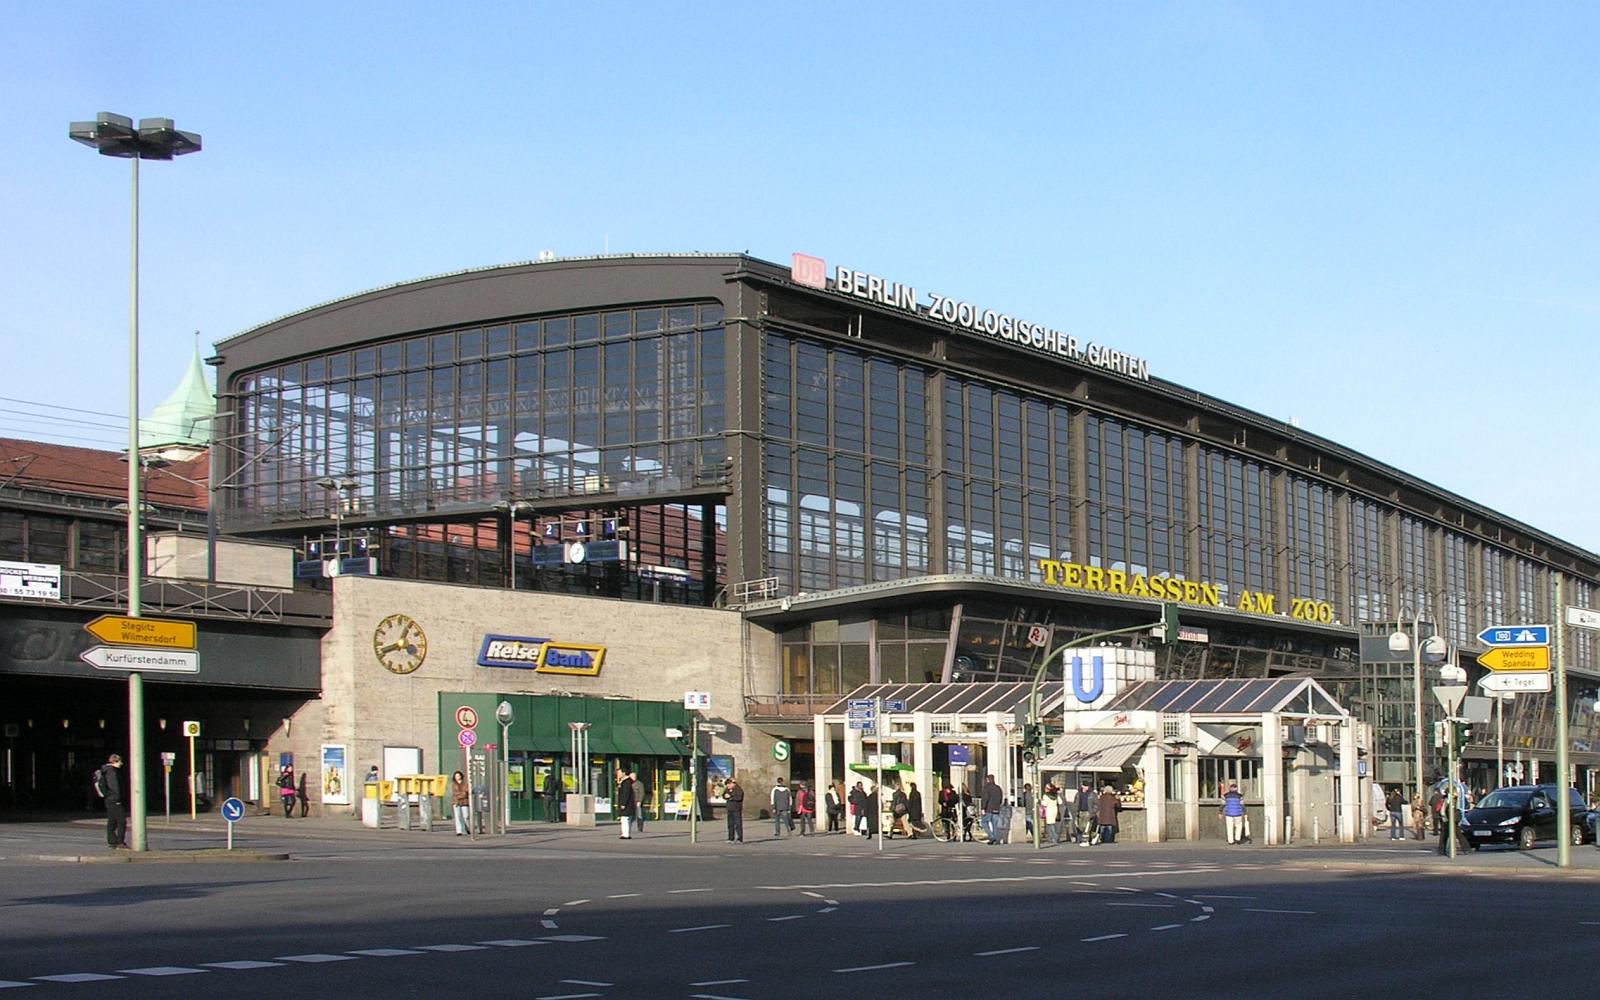 Stazione Di Berlin Zoologischer Garten Wikiwand